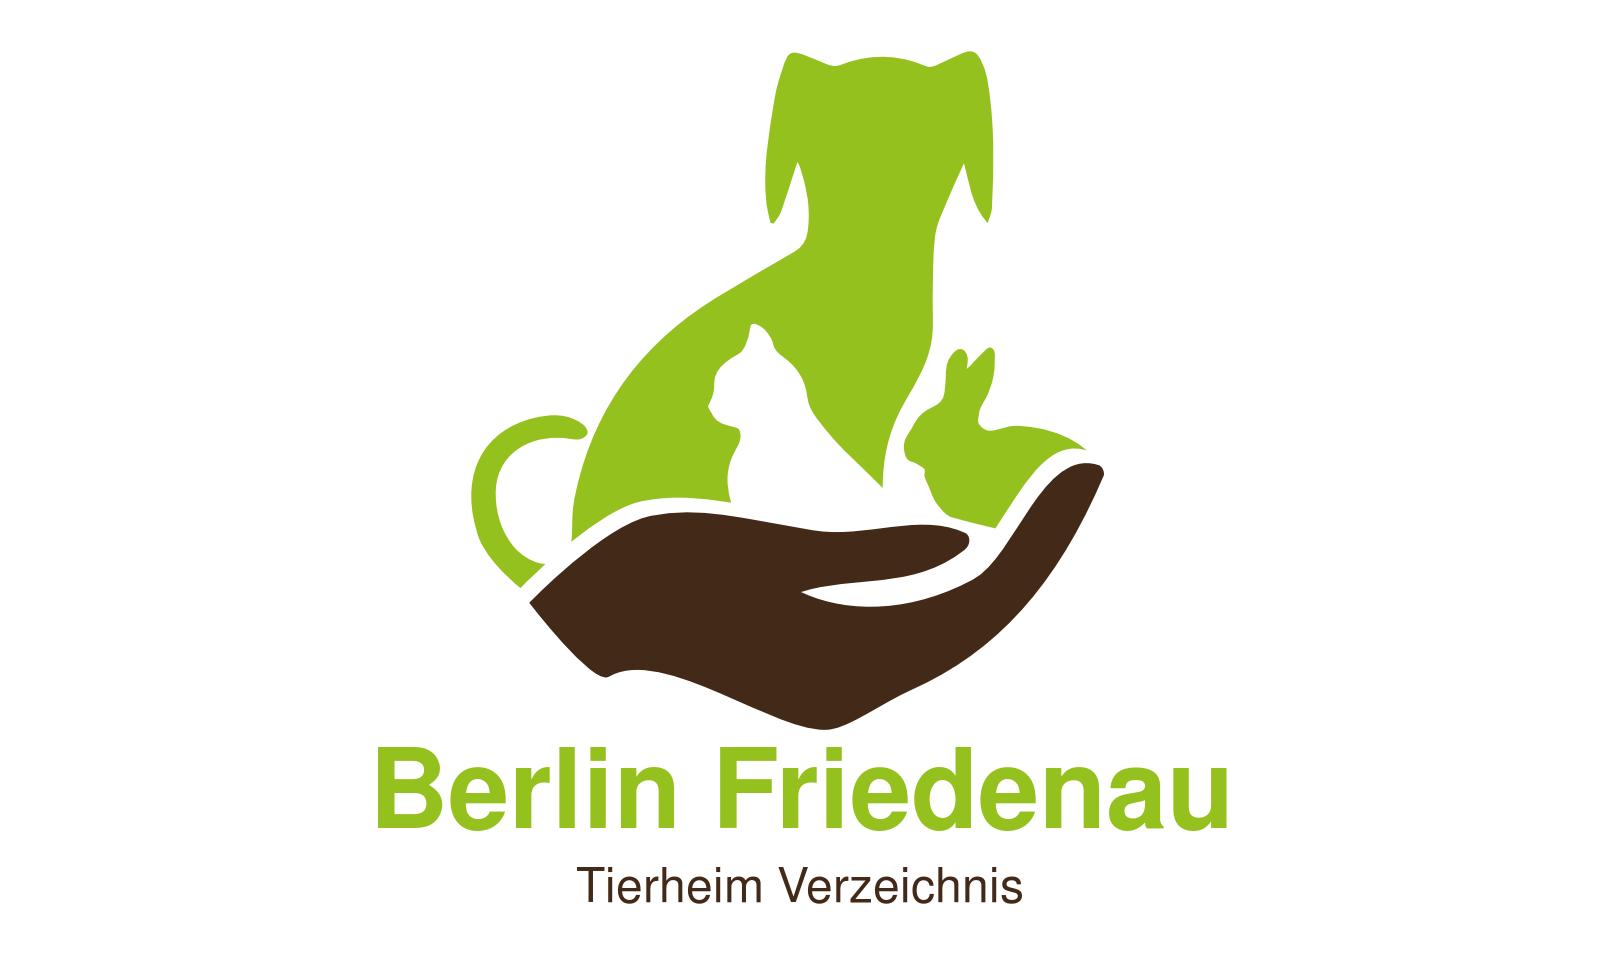 Tierheim Berlin Friedenau